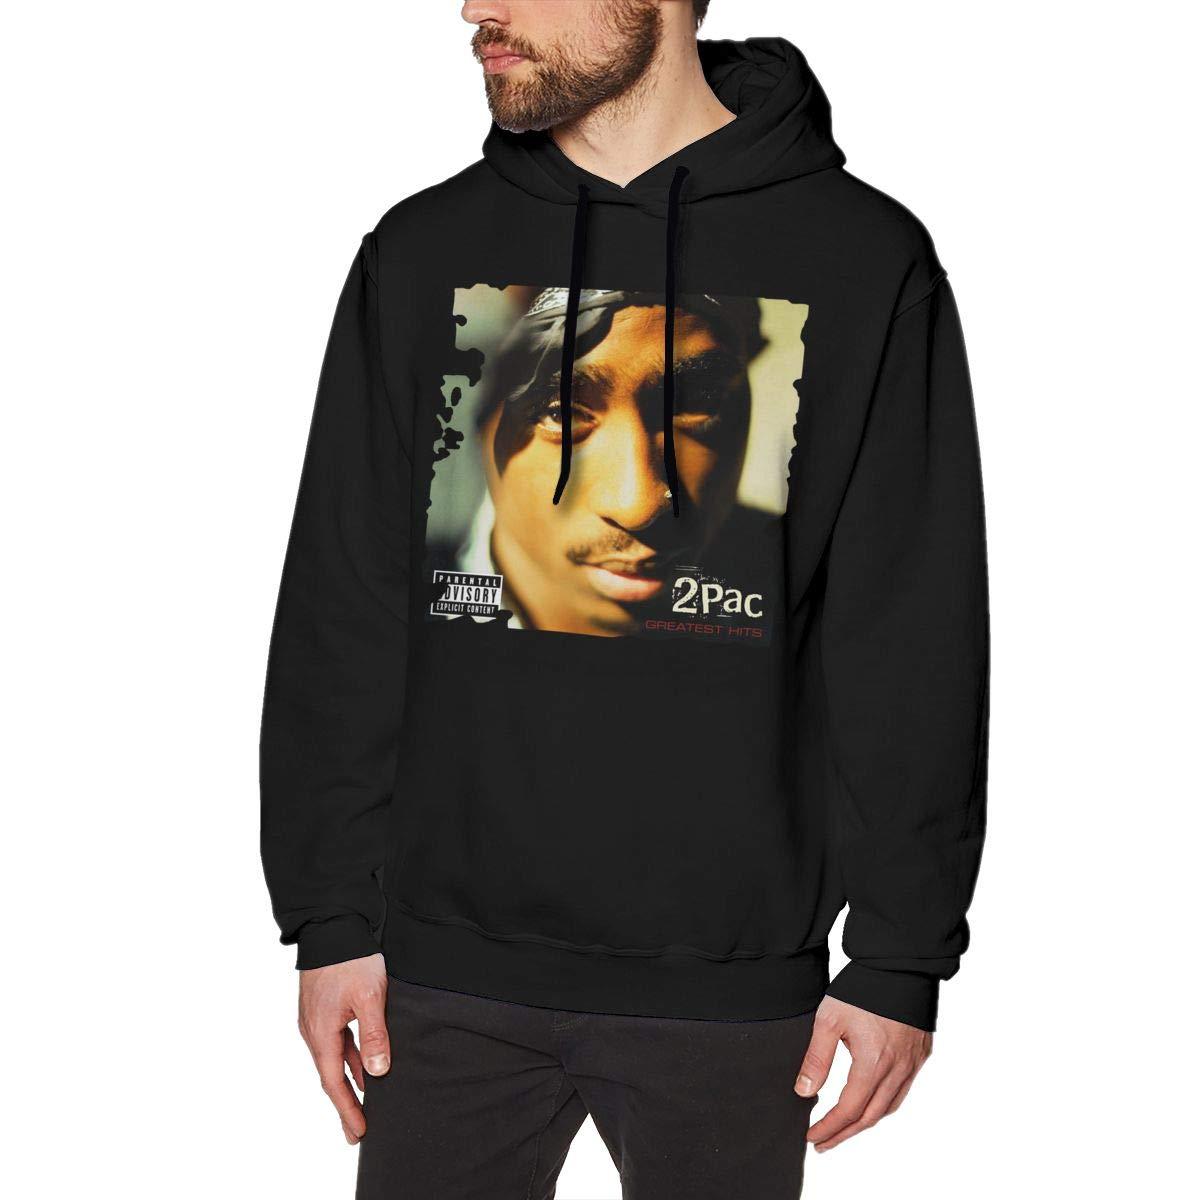 Sipdgxkkza S 2pac Greatest Hits Cool Black Shirts